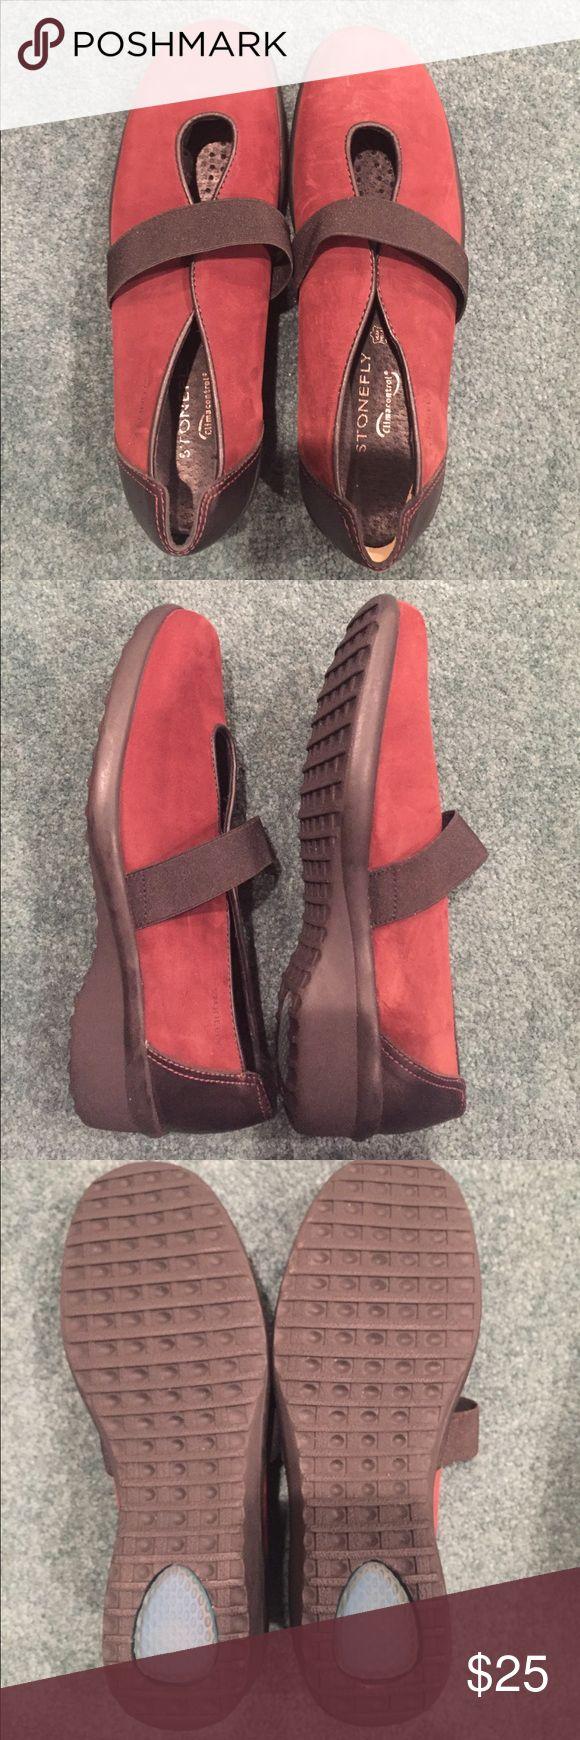 "NWOT Stonefly maroon suede shoes NWOT Stonefly maroon suede shoes. 1"" heel. EU 37. Never worn (see 3rd pic). Some scuffs in suede (see 4th pic). Stonefly Shoes Wedges"